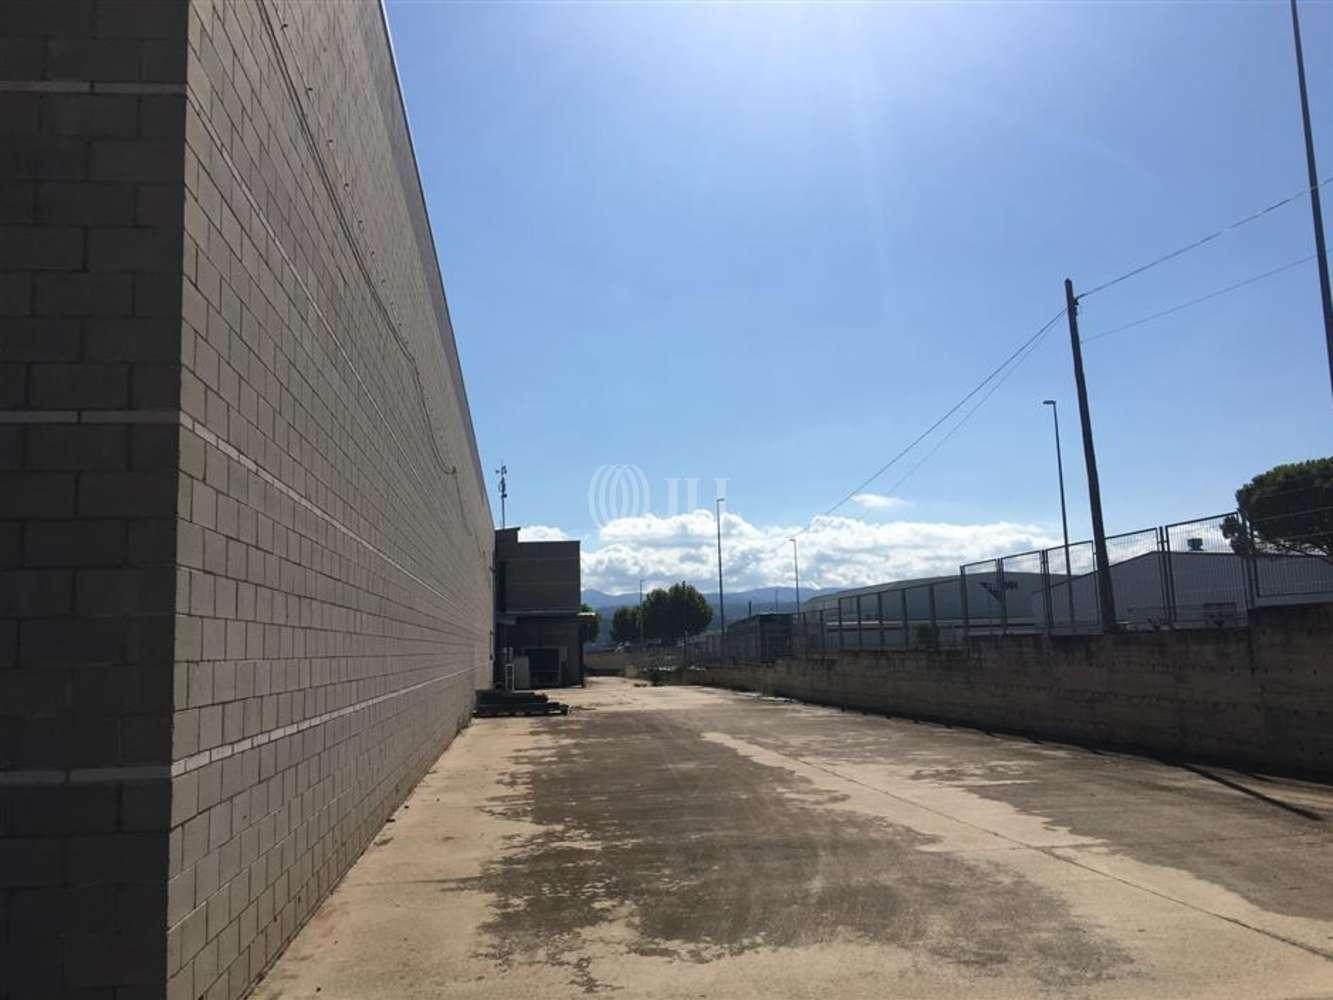 Naves industriales y logísticas Sant fruitós de bages, 08272 - Nave Logistica - B0425 - PI SANT ISIDRE - 8730